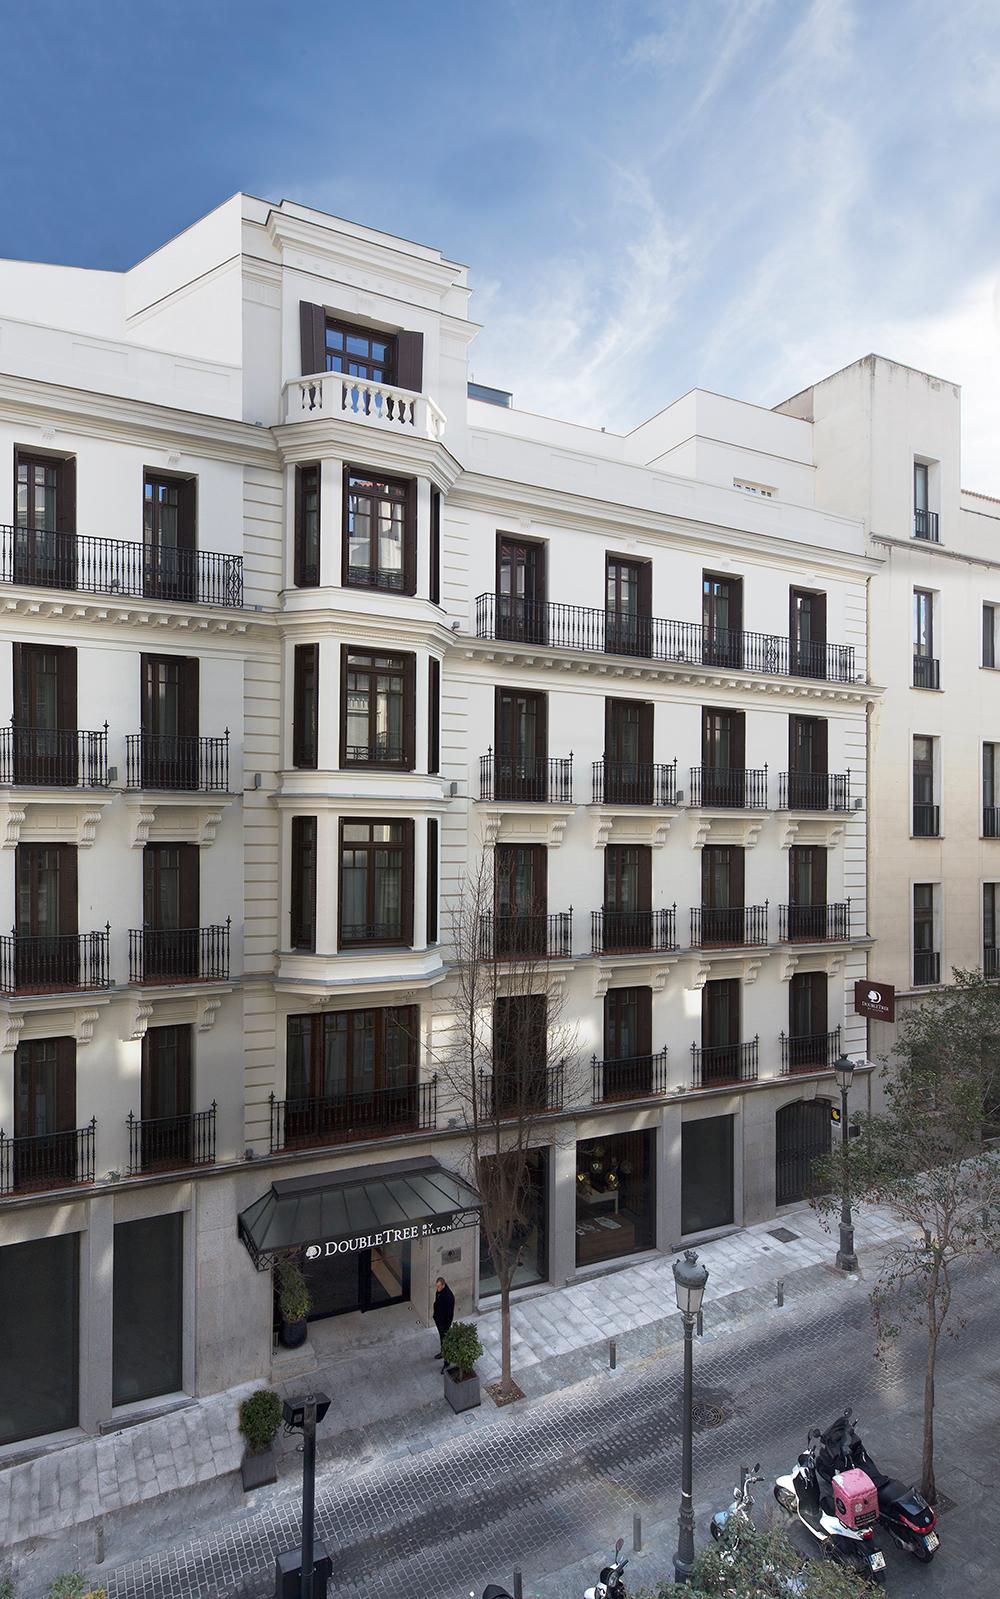 fachada doubletree by hilton madrid